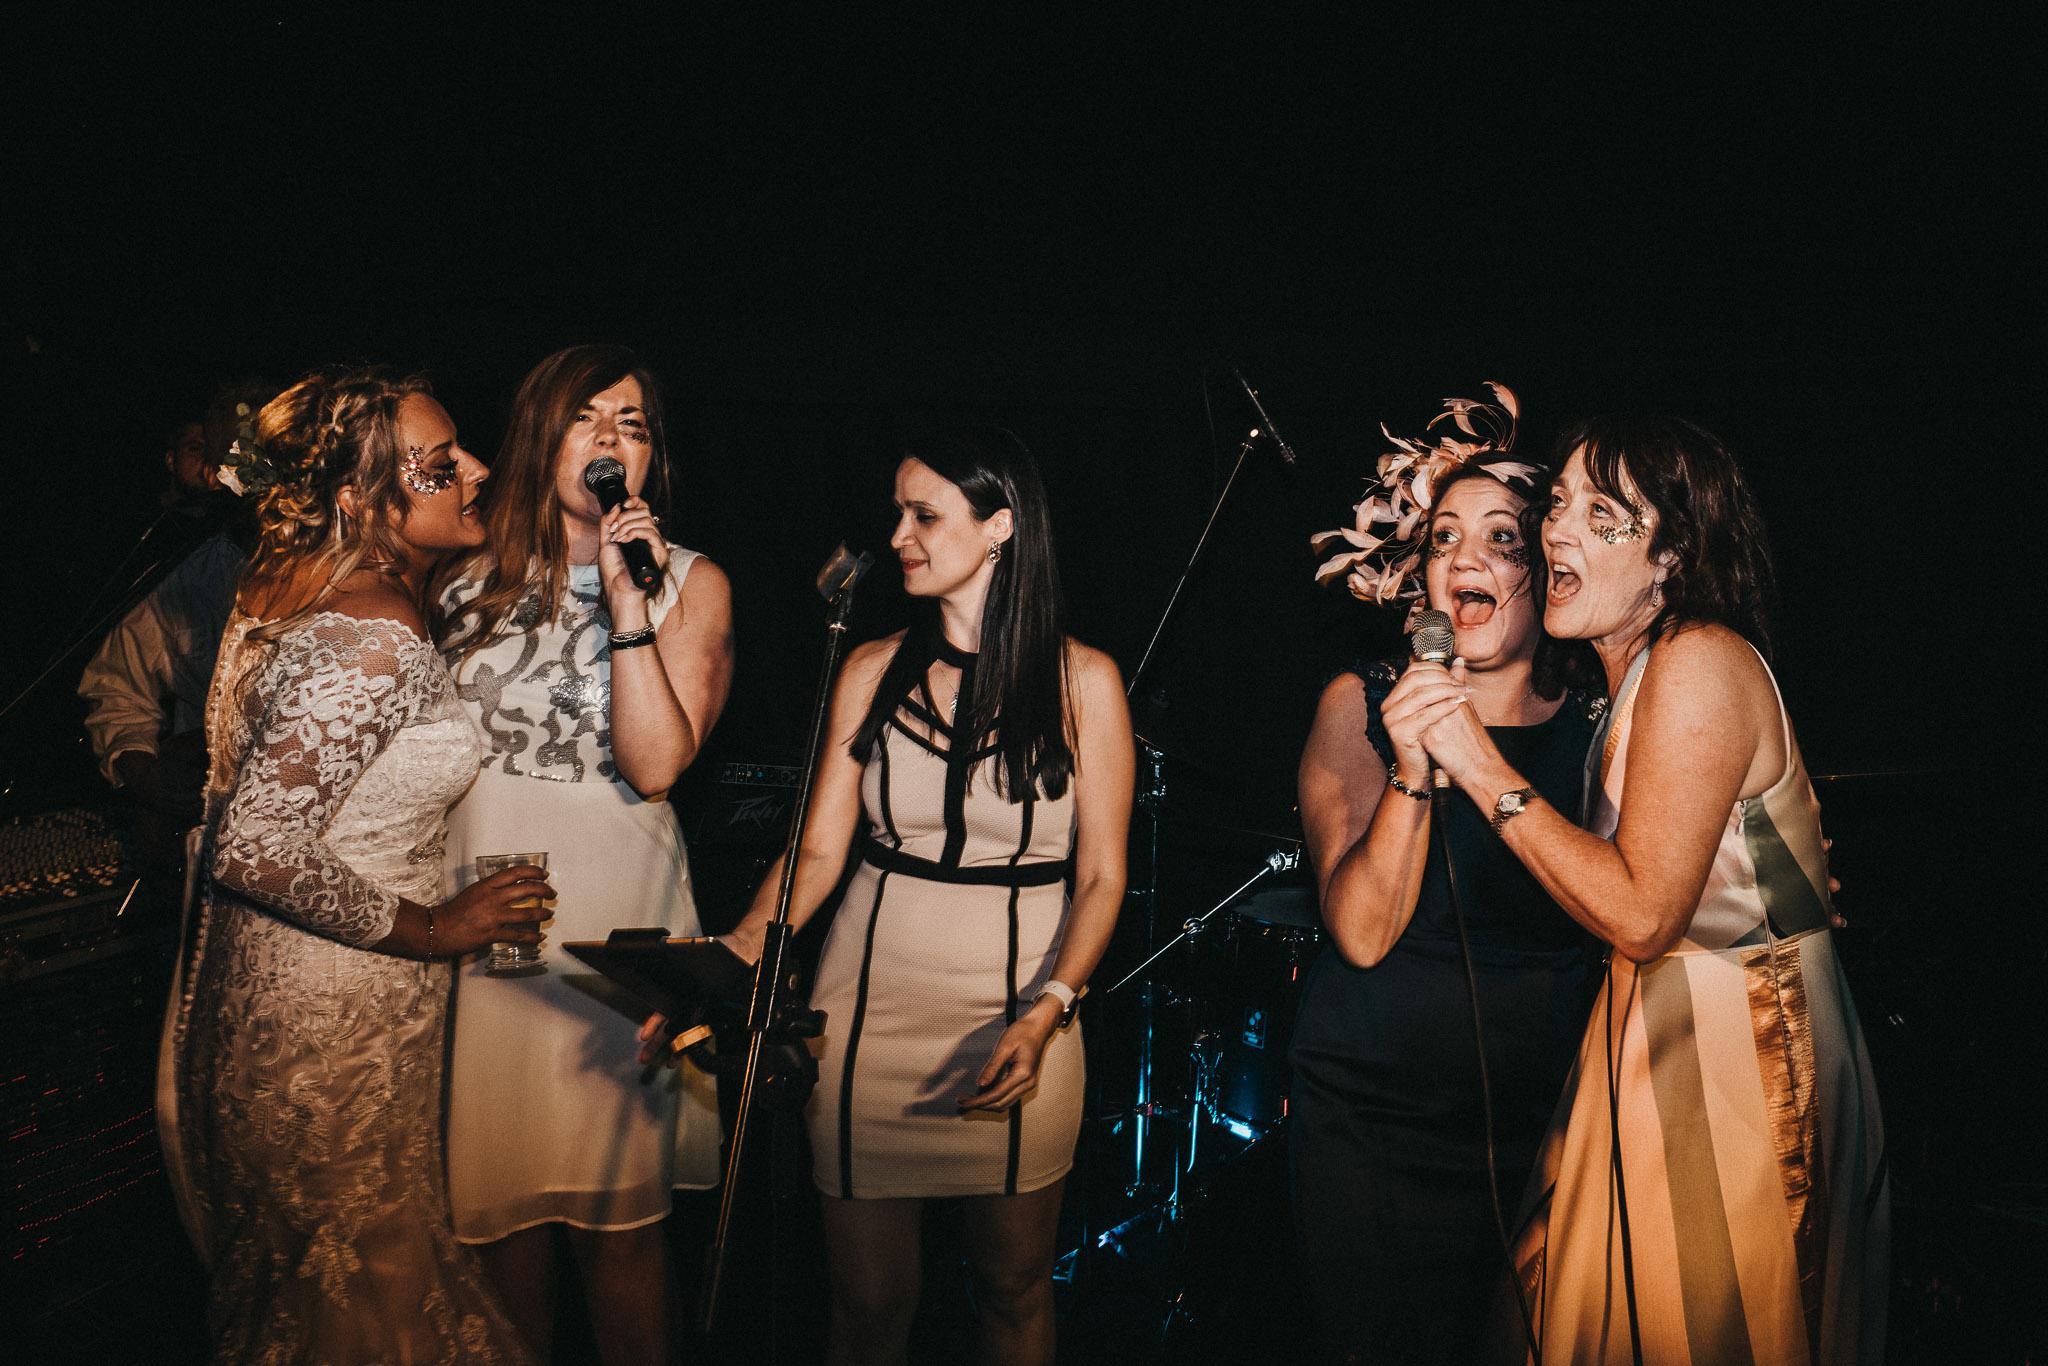 wedding-karaoke-pictures